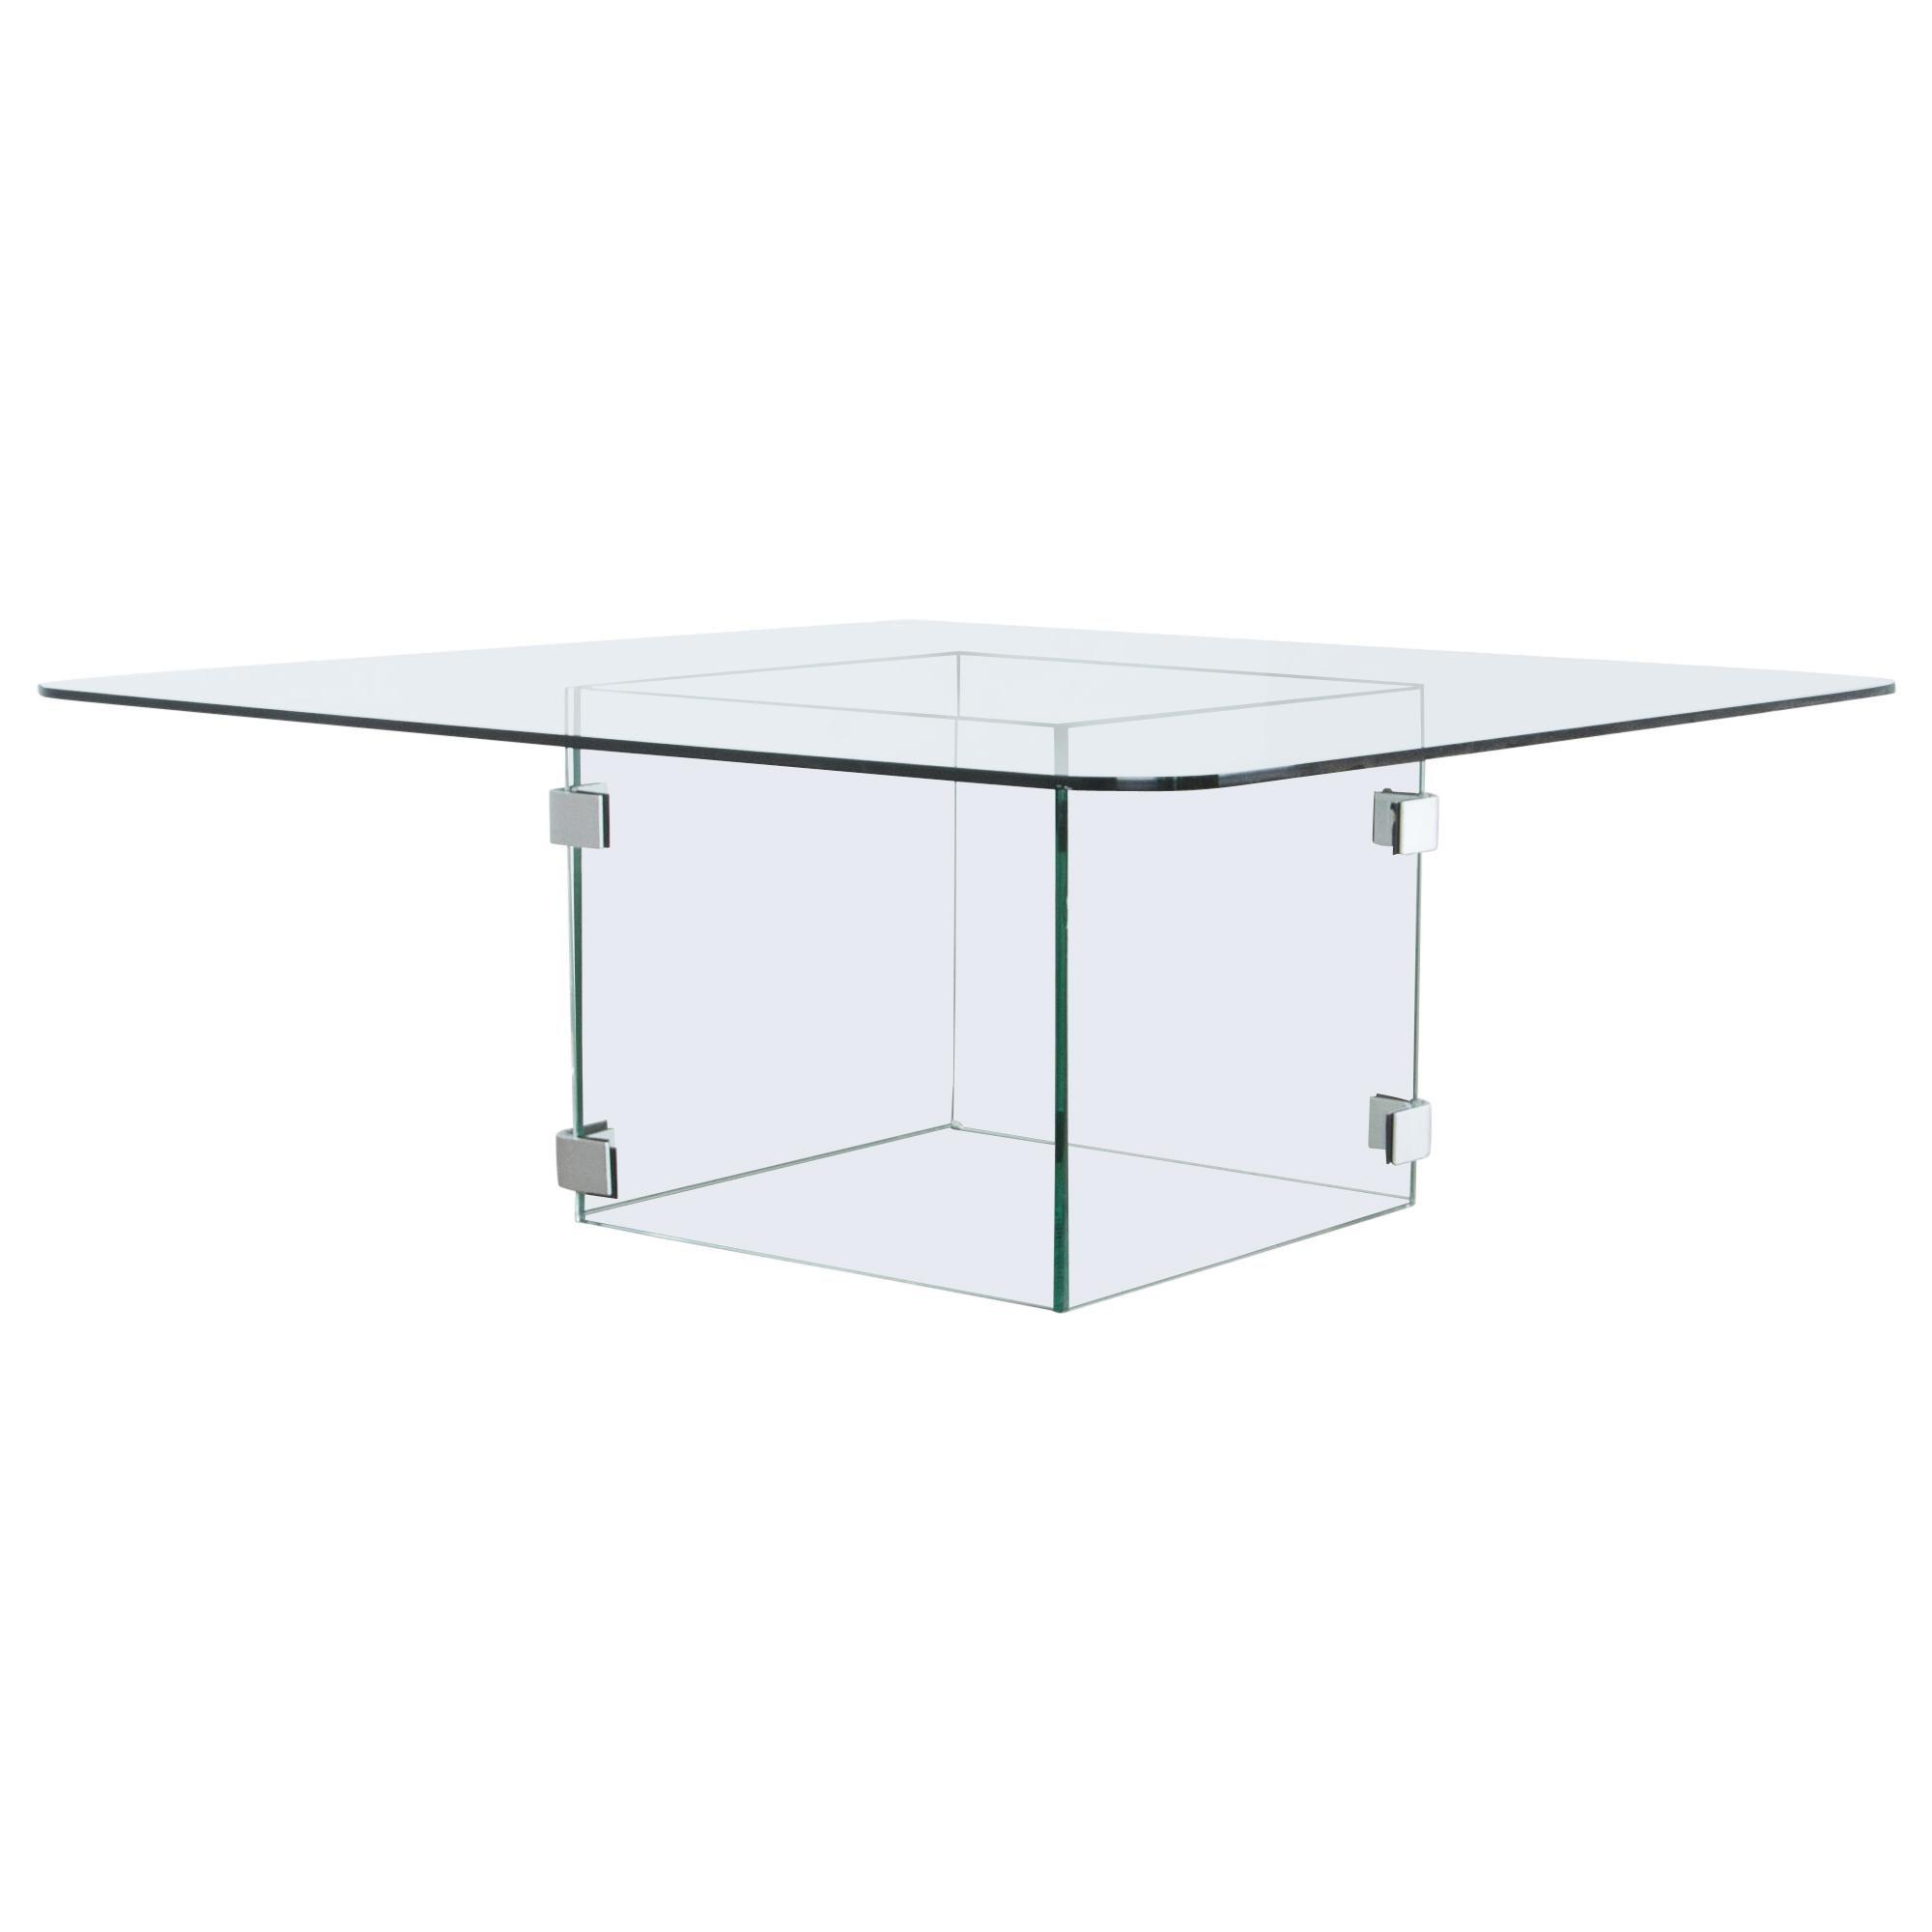 1960s Italian Minimal Glass Coffee Table